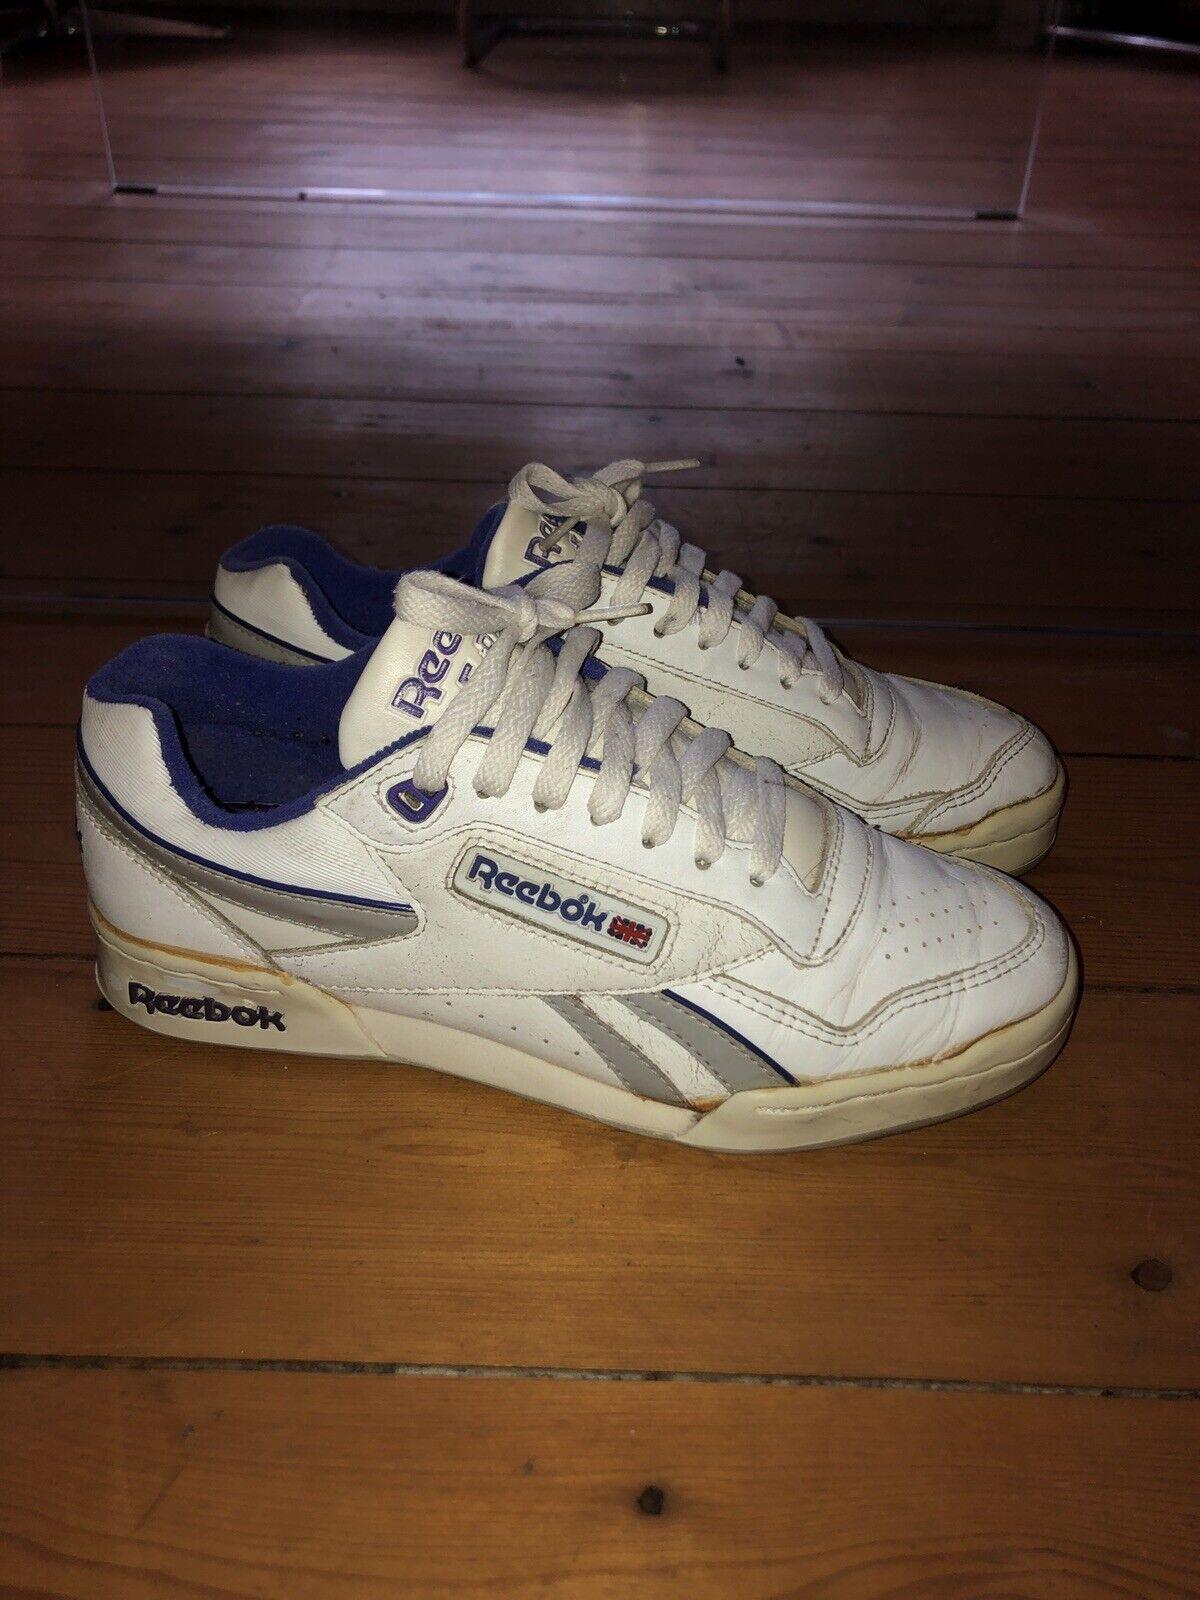 Vintage reebok classic de tenis ers 90s 90er 41,5